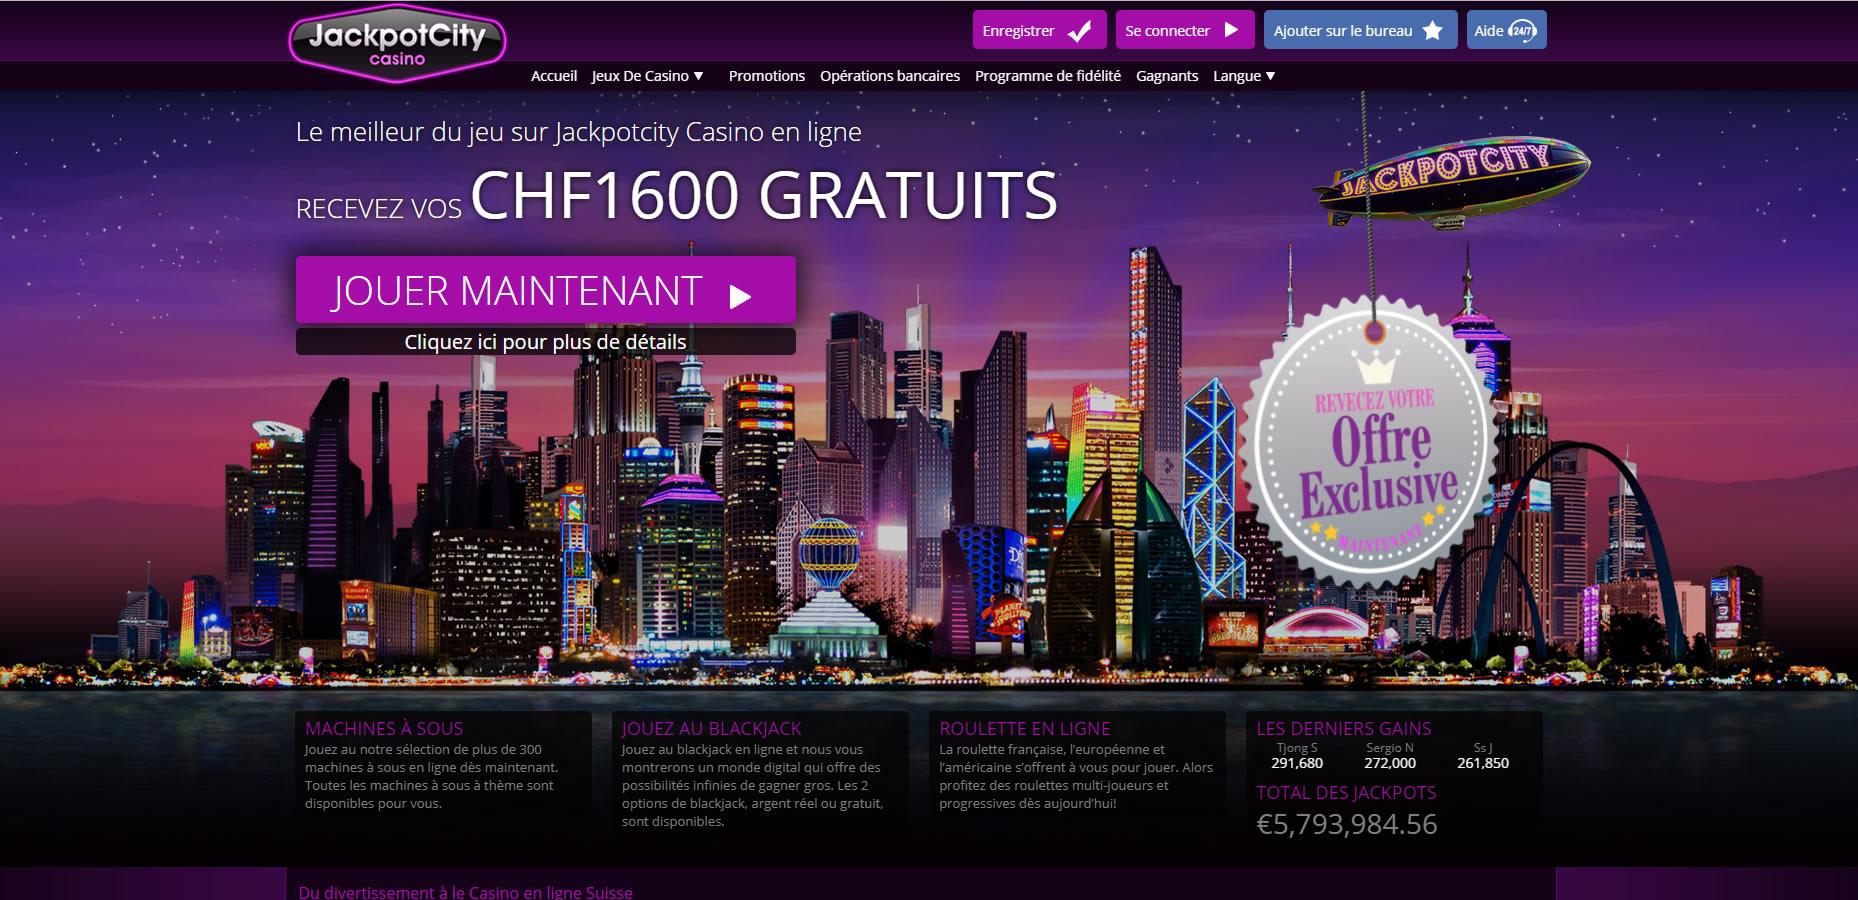 Jackpot city casino avis uitbetaling klaver casino